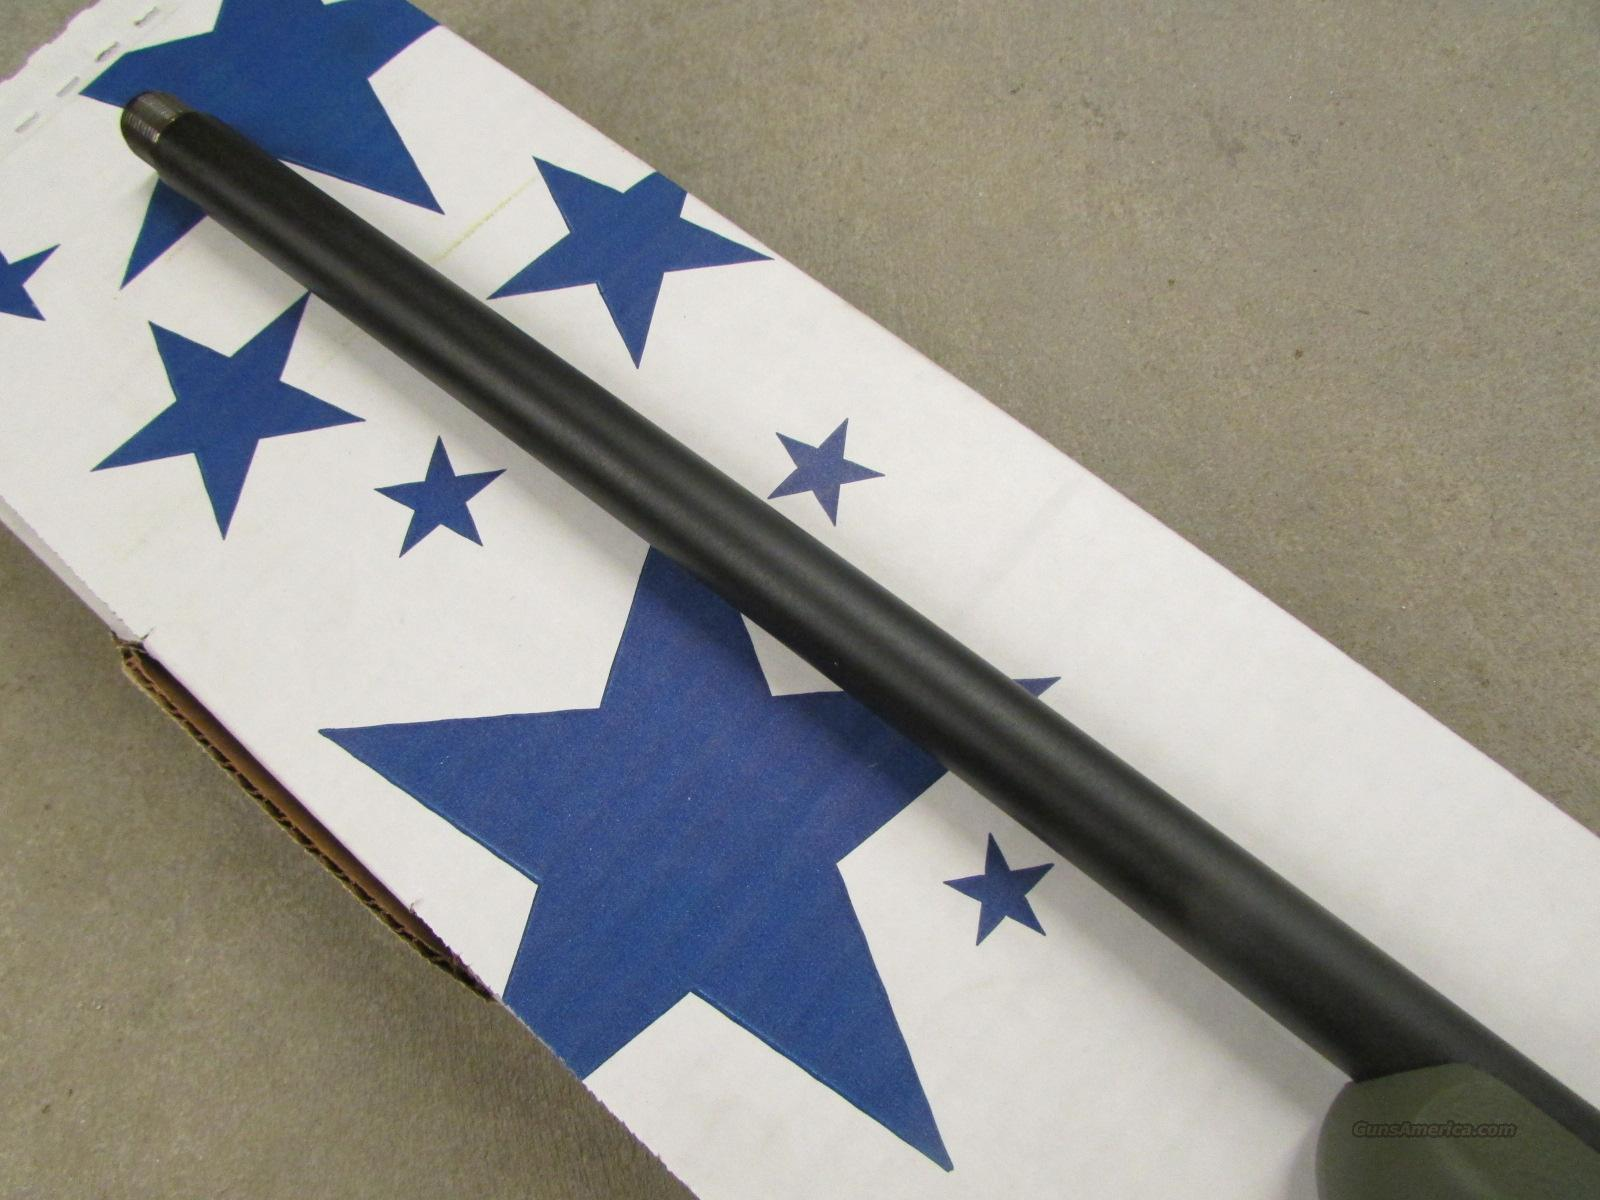 Top Five Ruger American 450 Bushmaster Barrel Thread - Circus